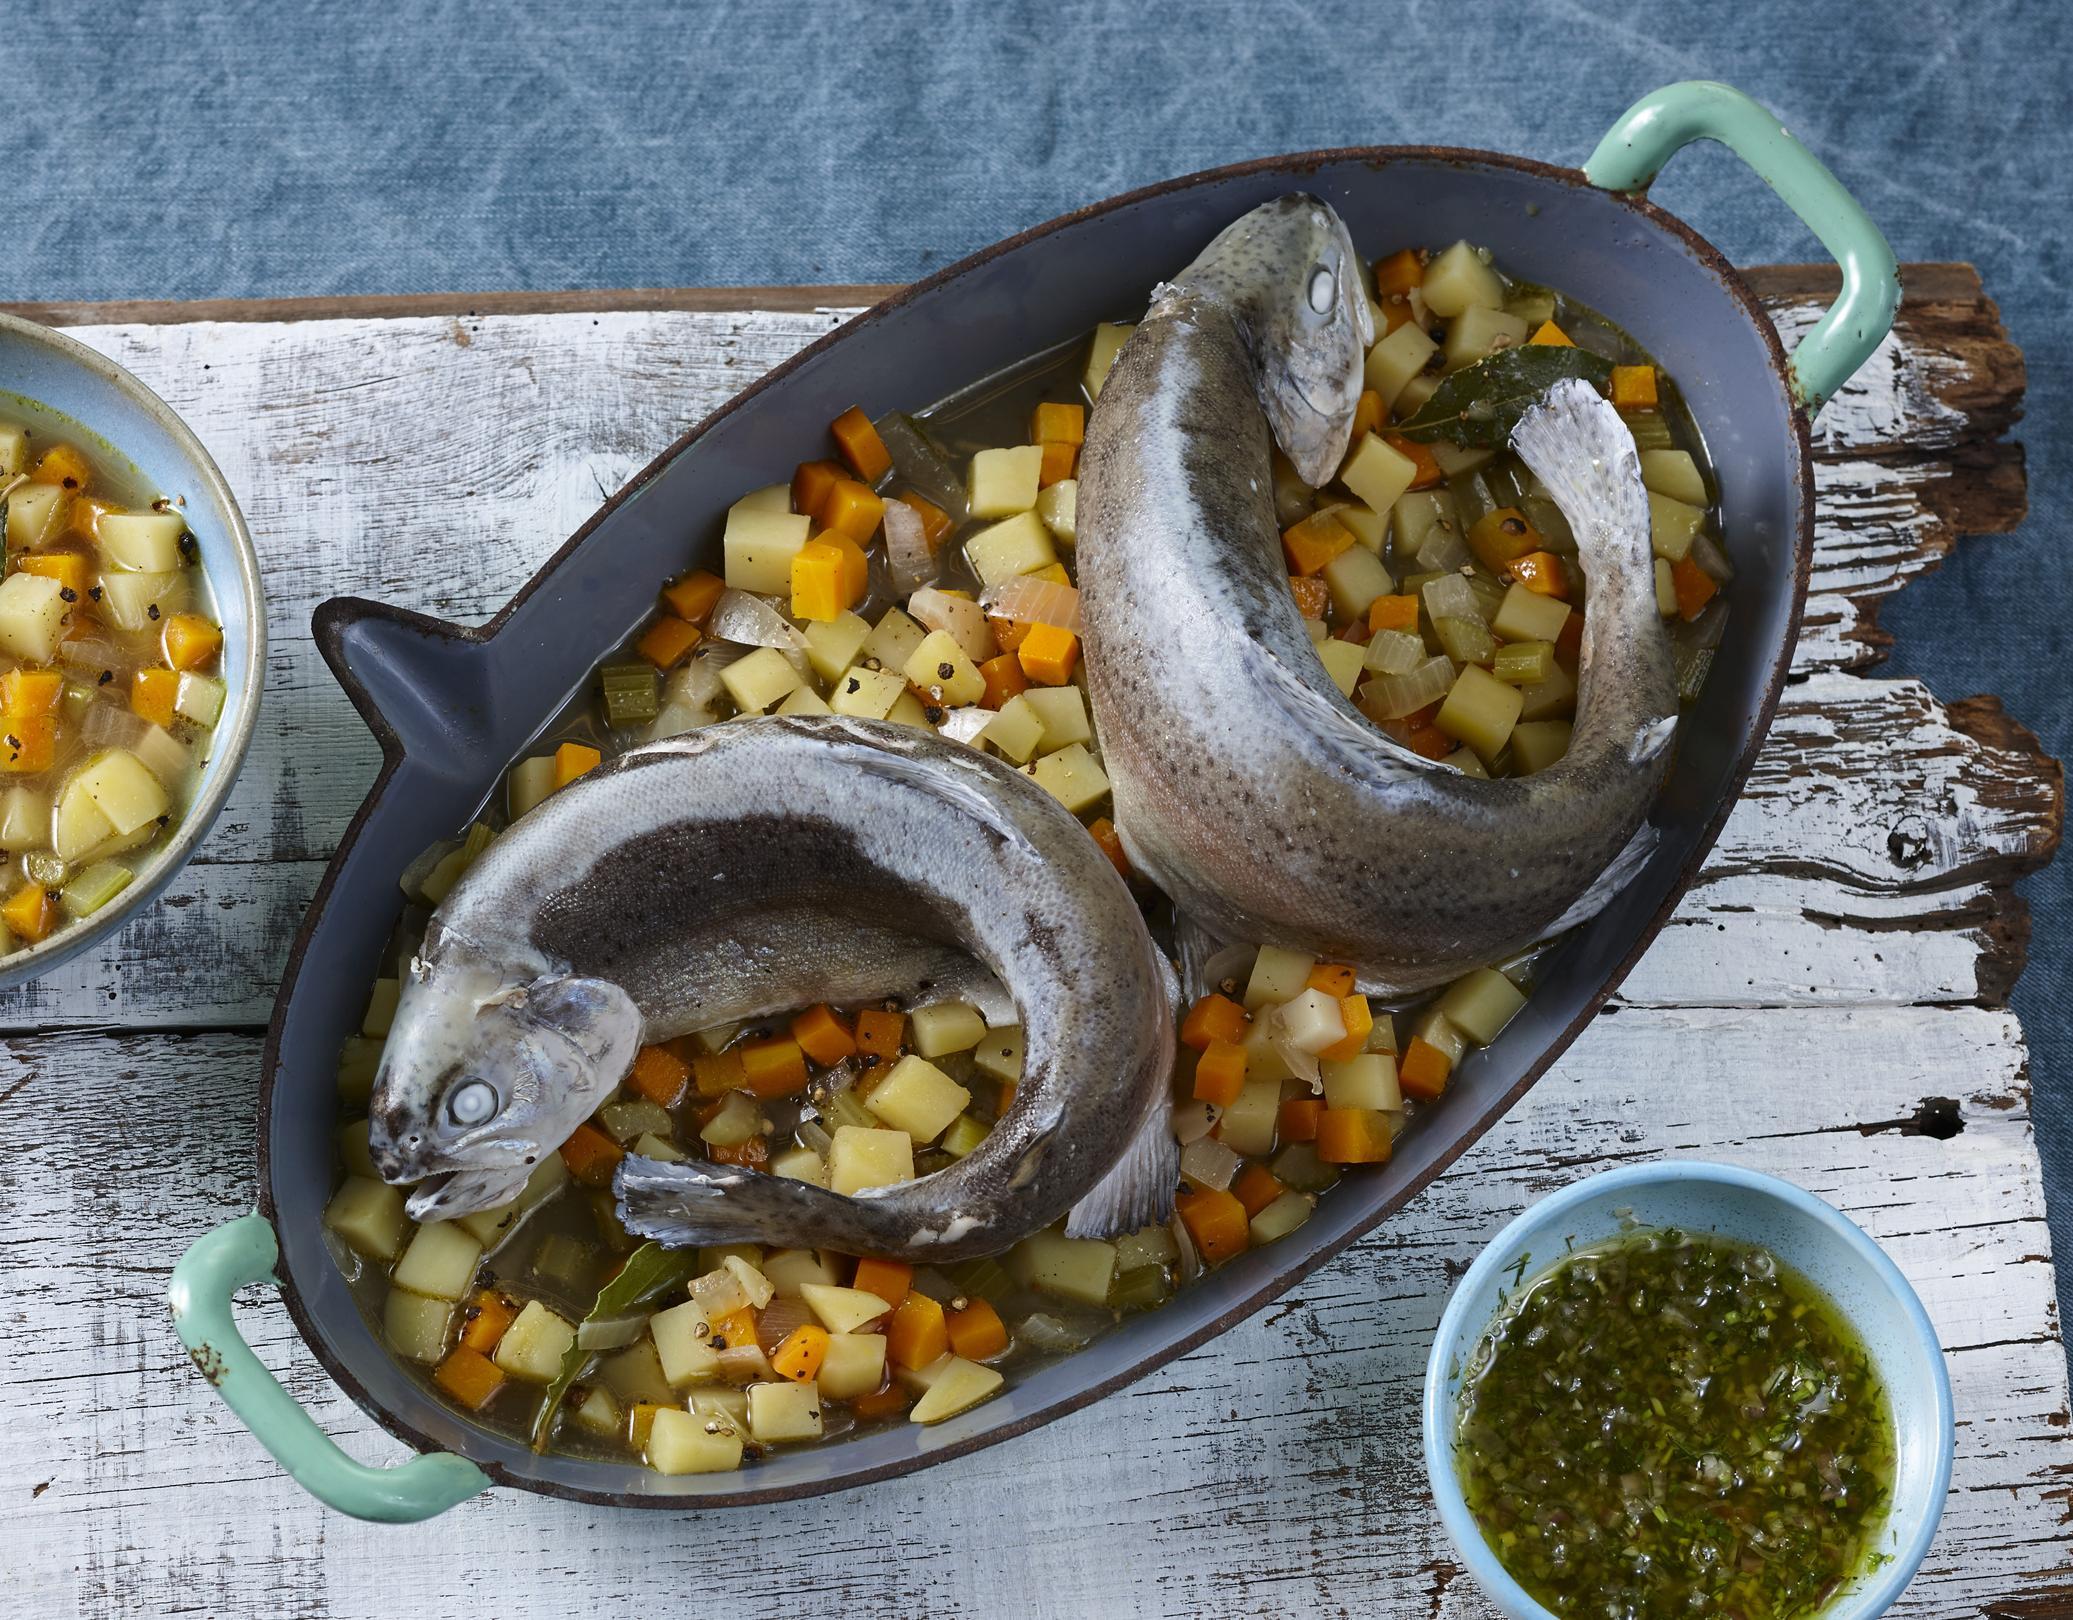 Rezepttipp: Forelle blau mit Schalotten-Vinaigrette